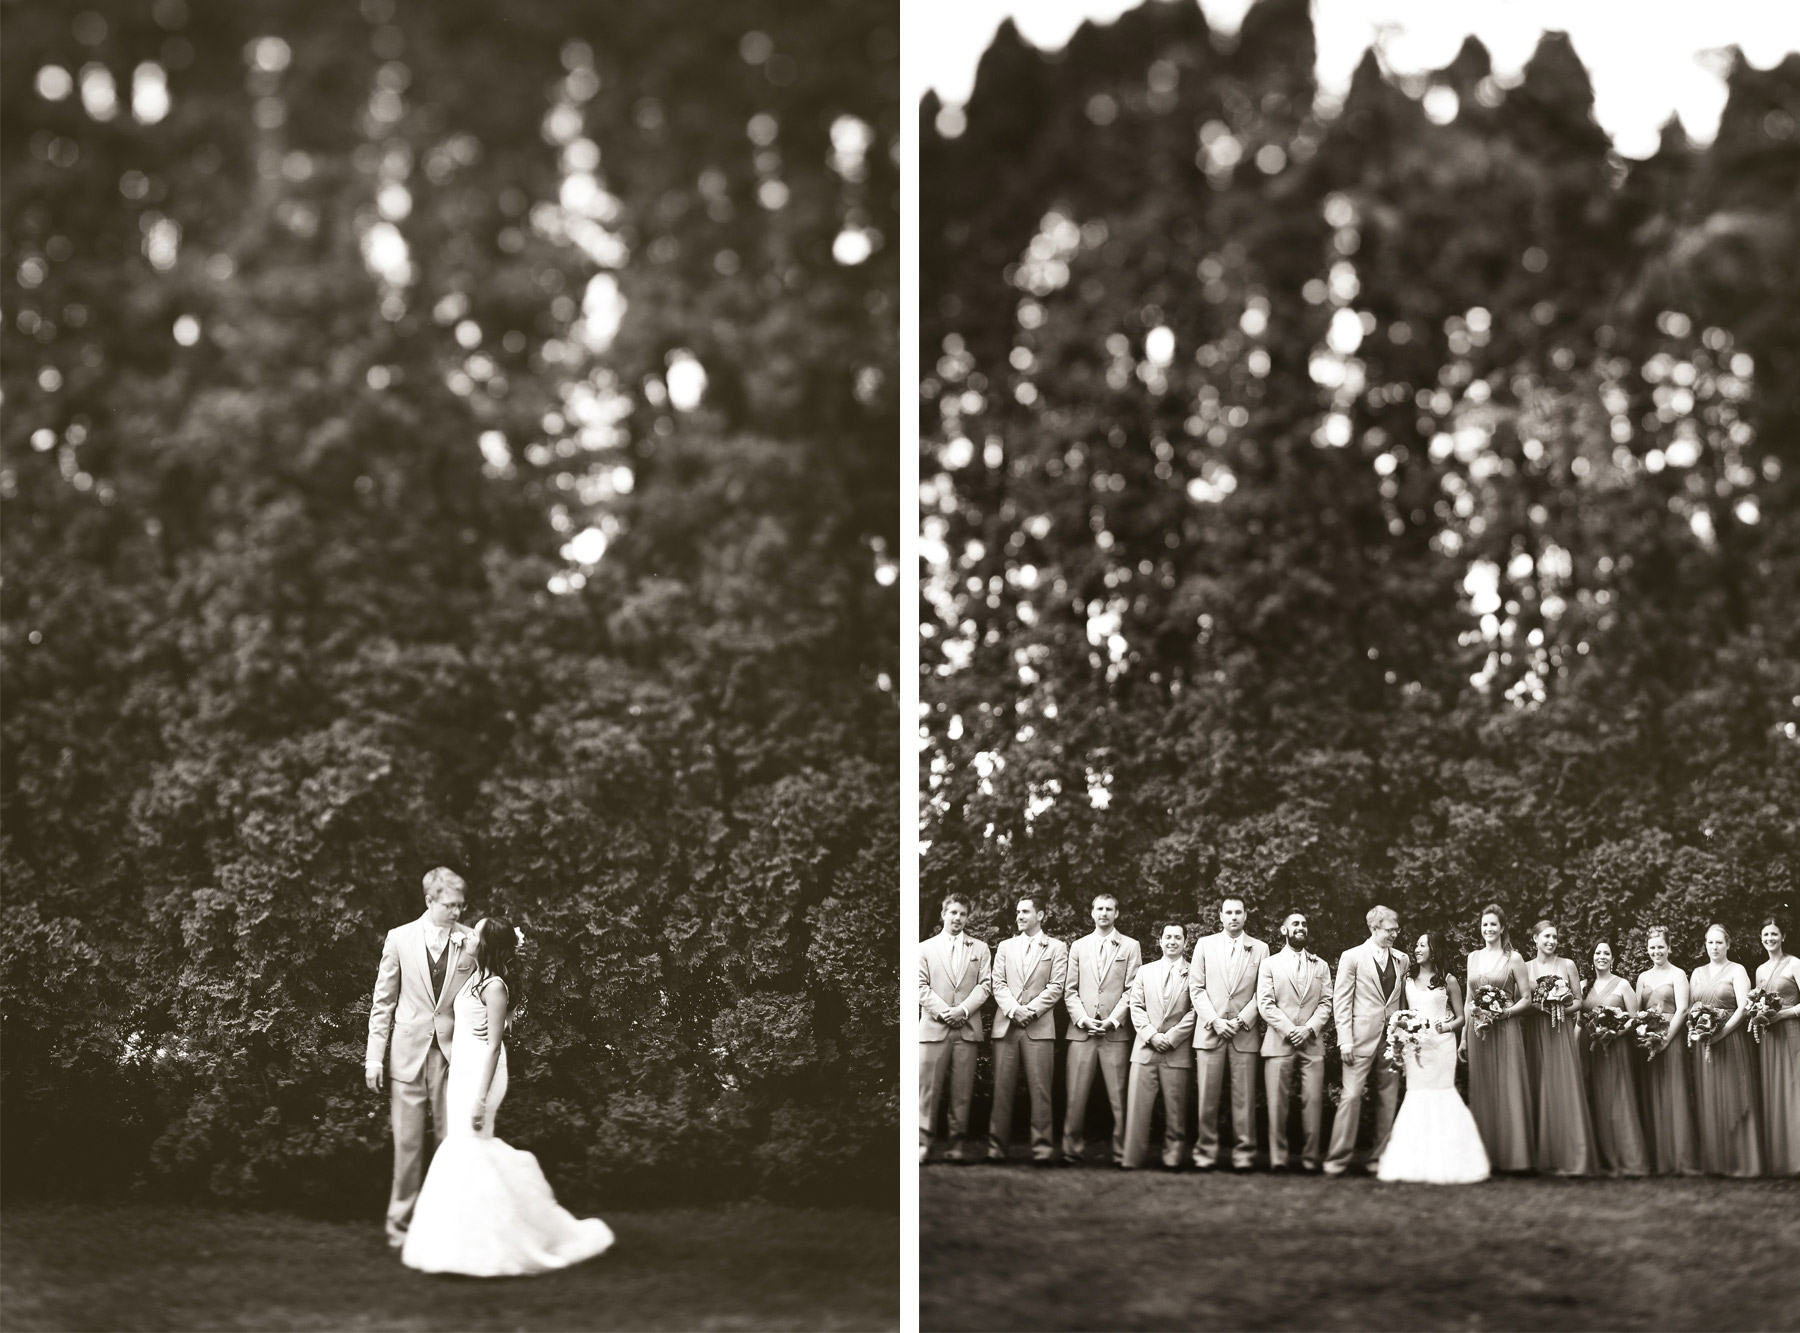 07-Minneapolis-Minnesota-Wedding-Photography-by-Vick-Photography-Garden-First-Look-Daphne-&-Austin.jpg